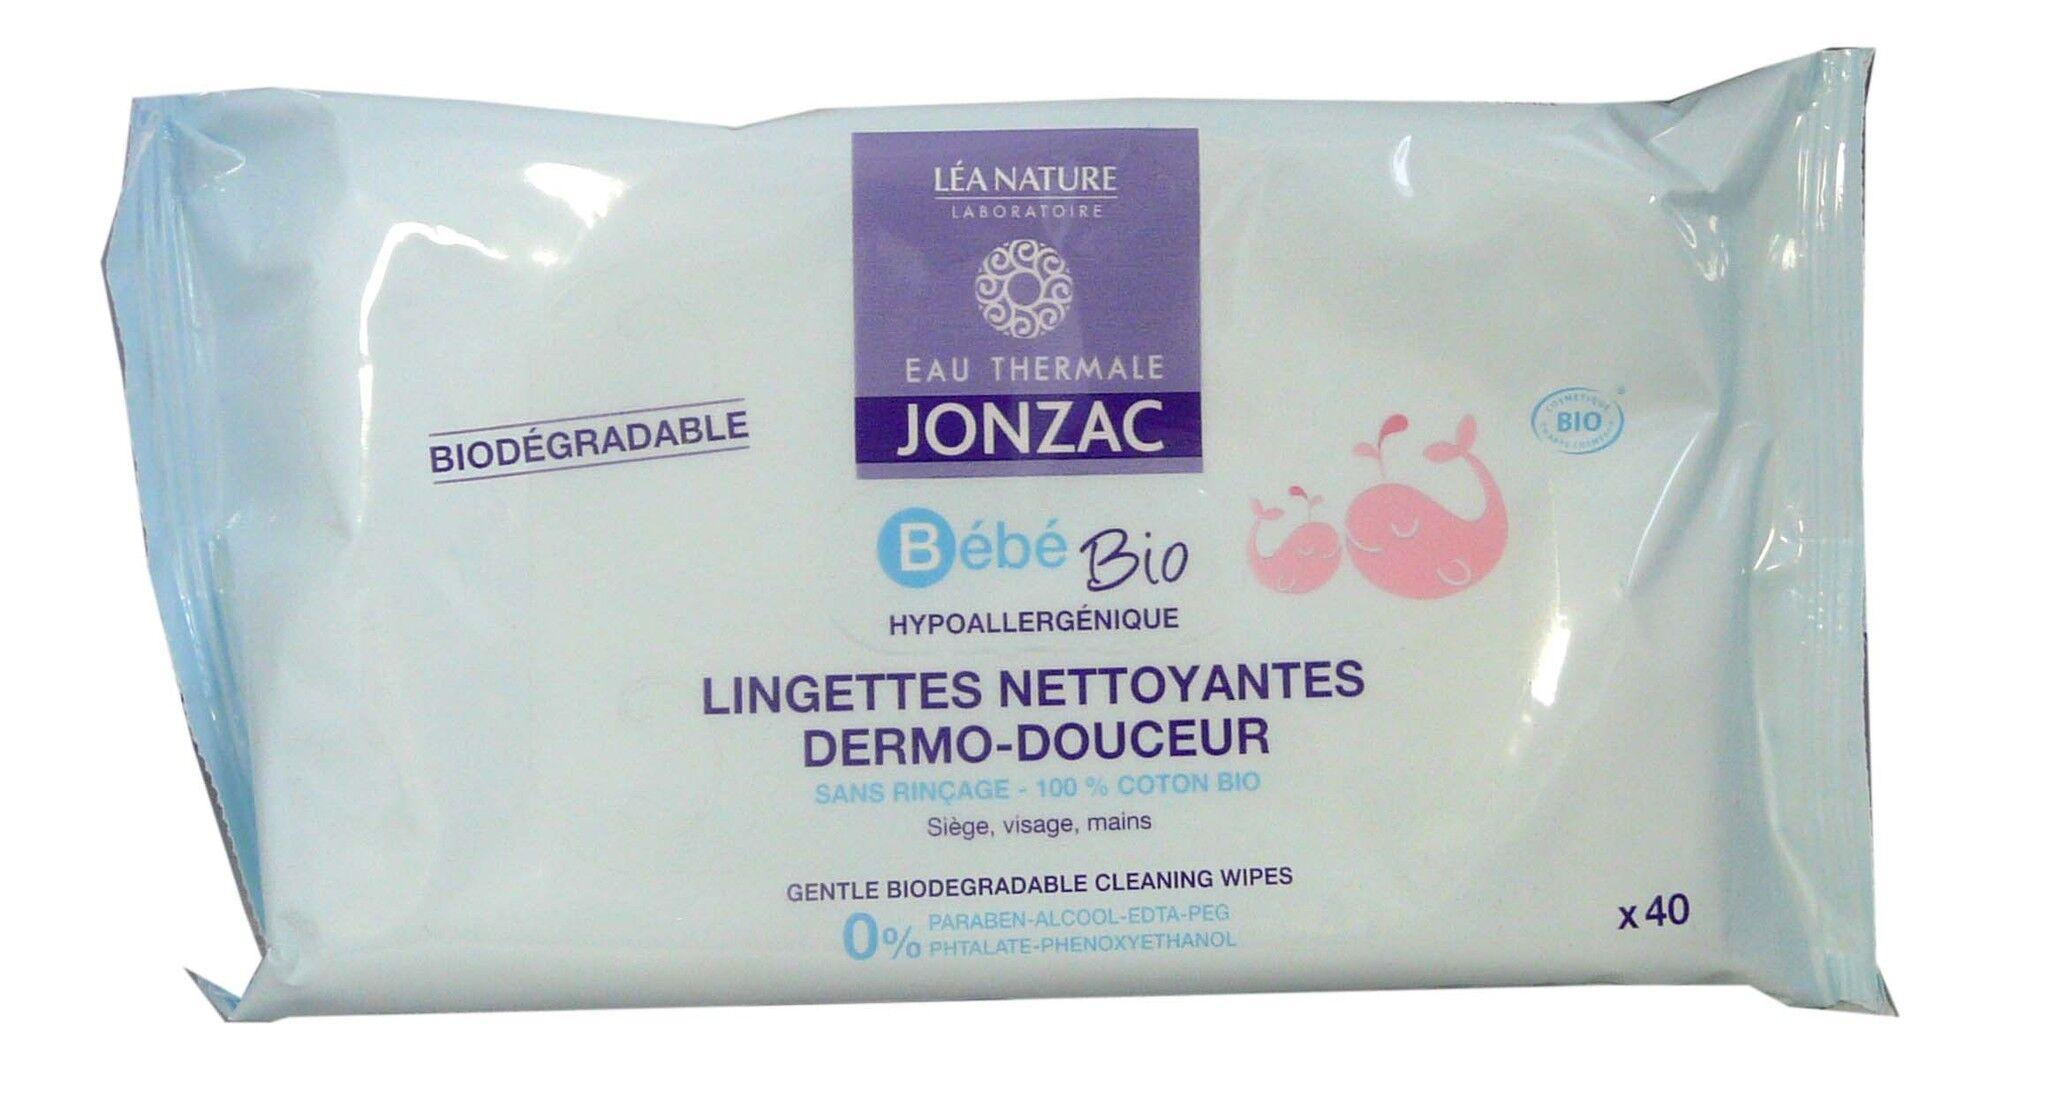 Jonzac bebe lingettes nettoyantes bio x40